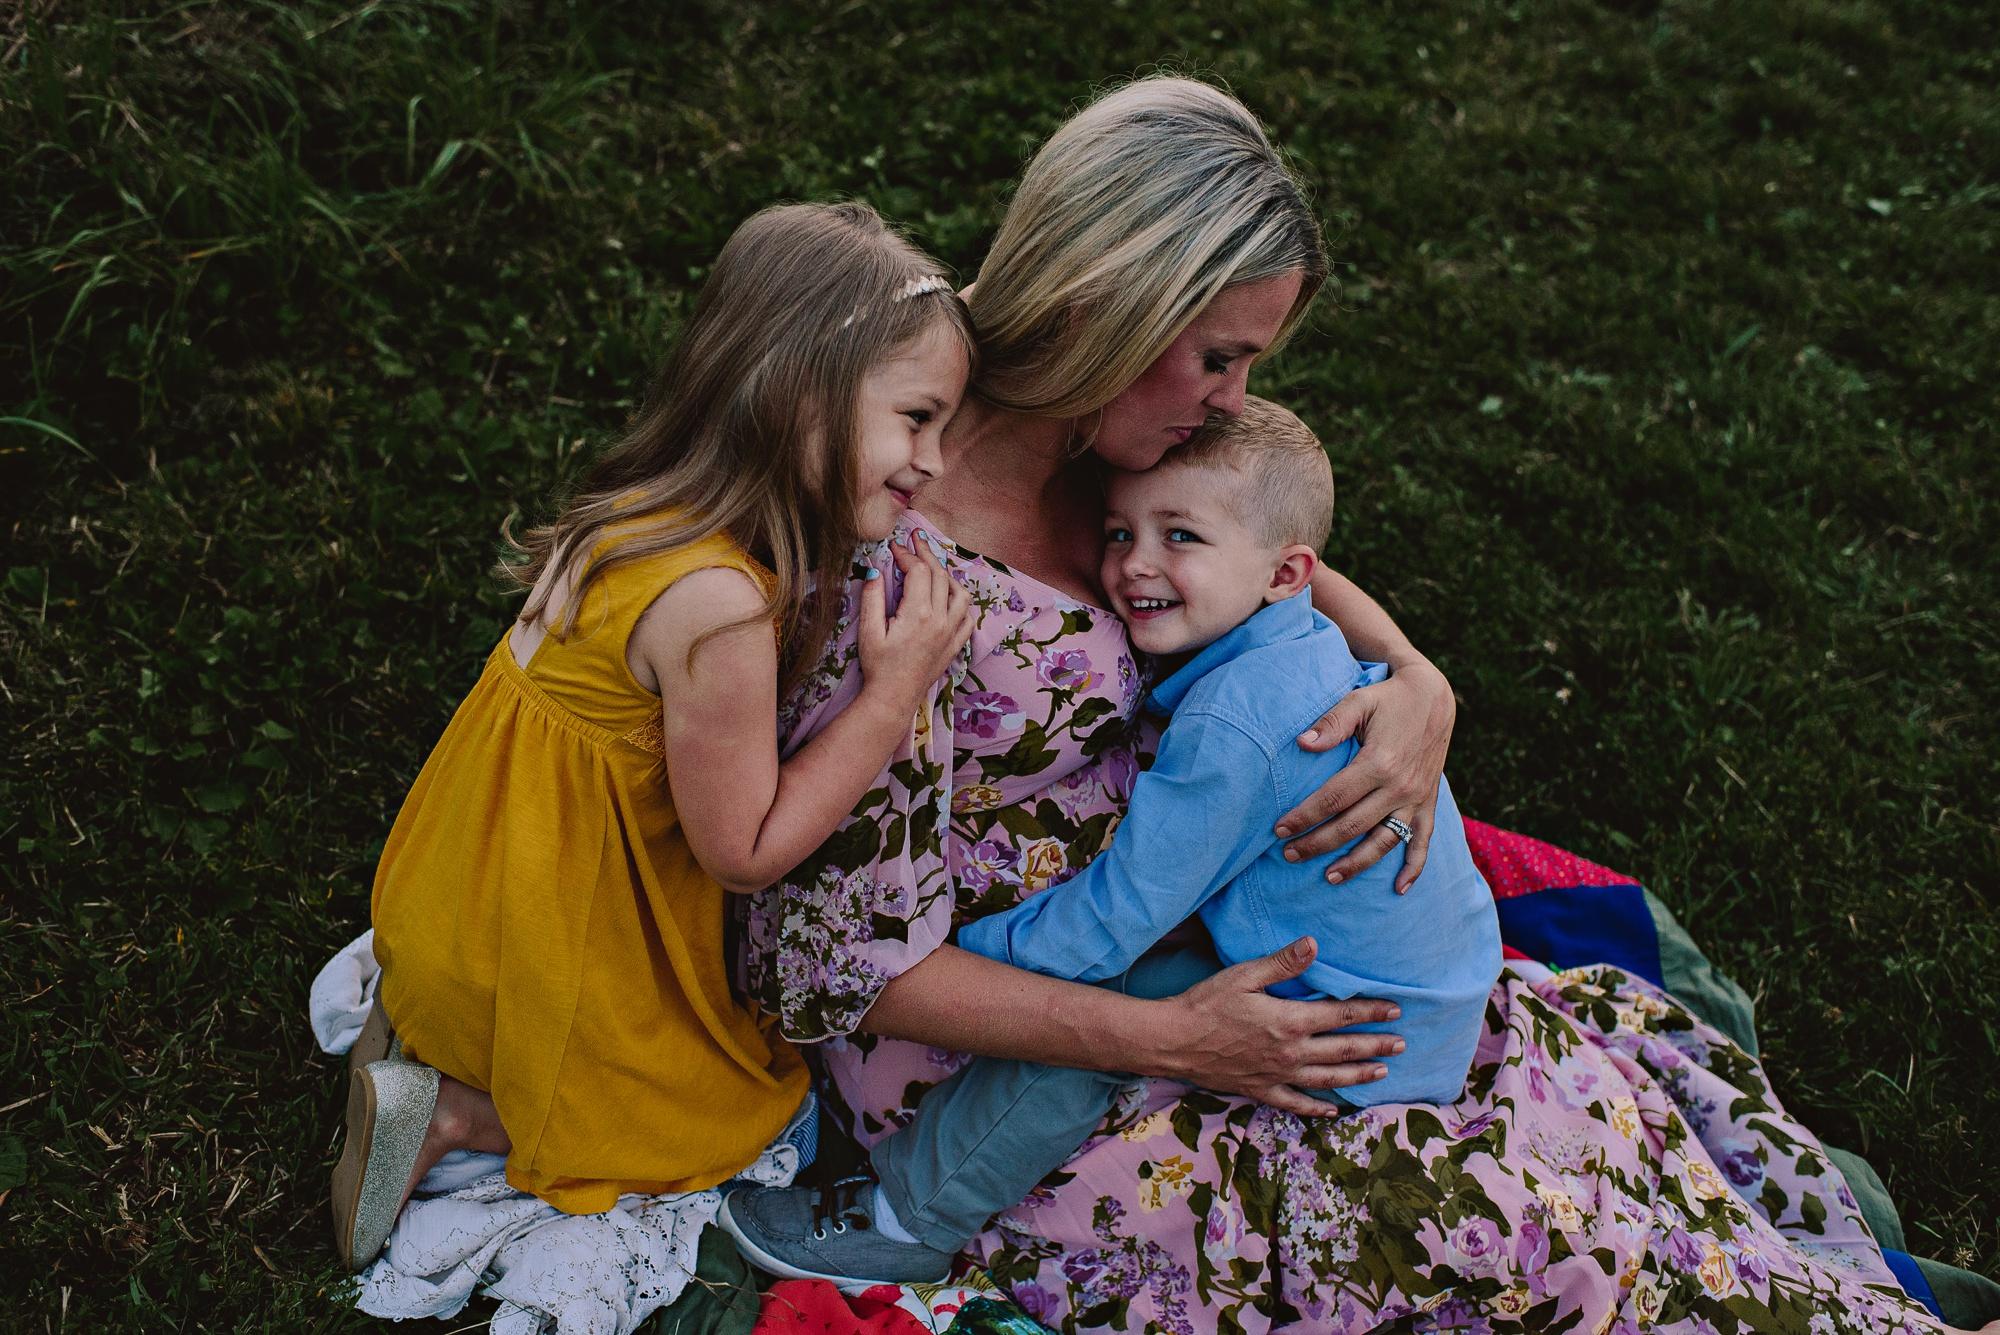 family-maternity-misanko-lauren-grayson-akron-ohio-photographer_0106.jpg